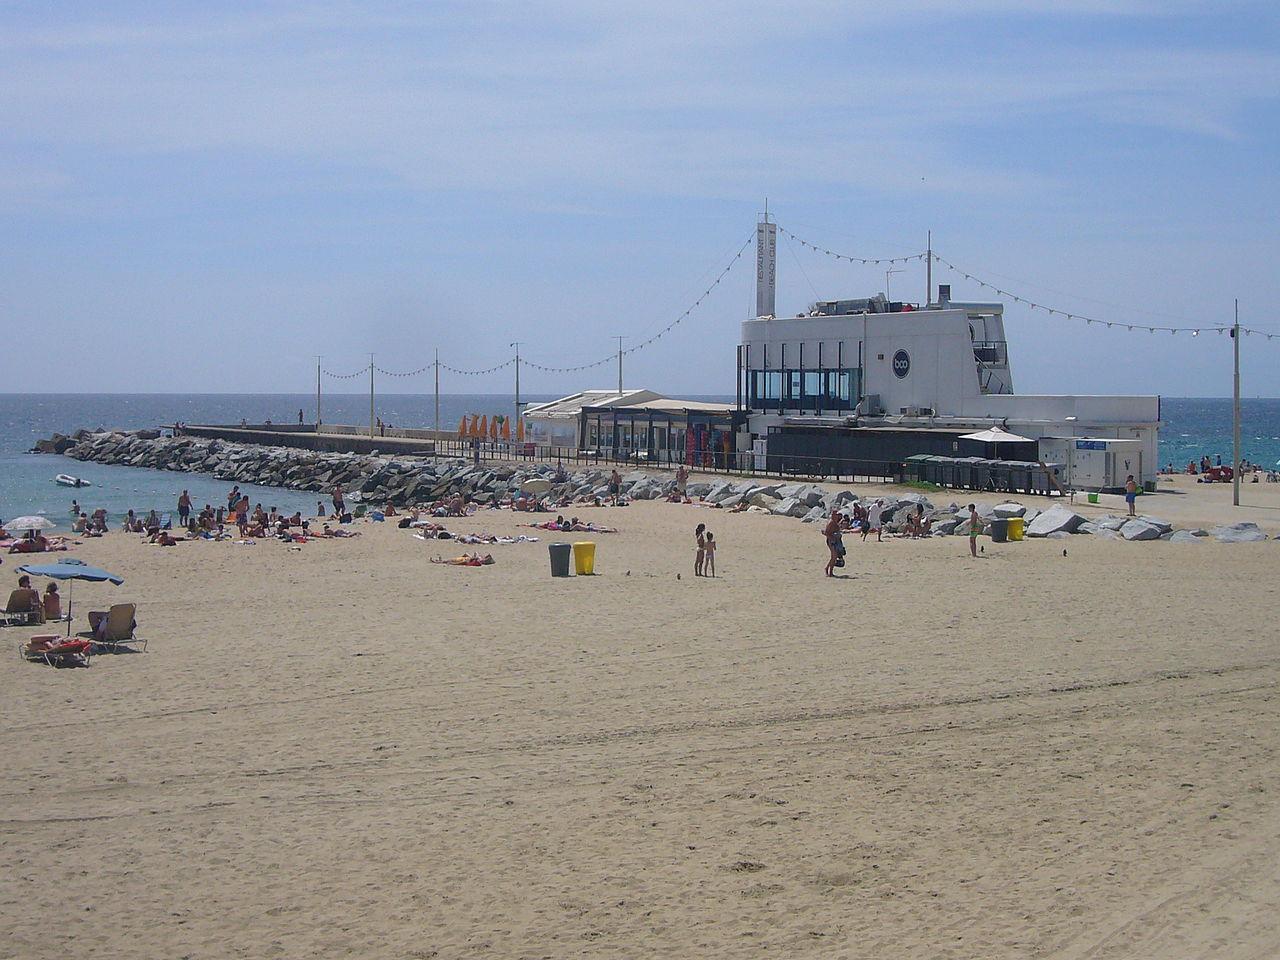 File:Platja de la Nova Mar Bella and Boo Restaurant and Beach Club.JPG - Wiki...